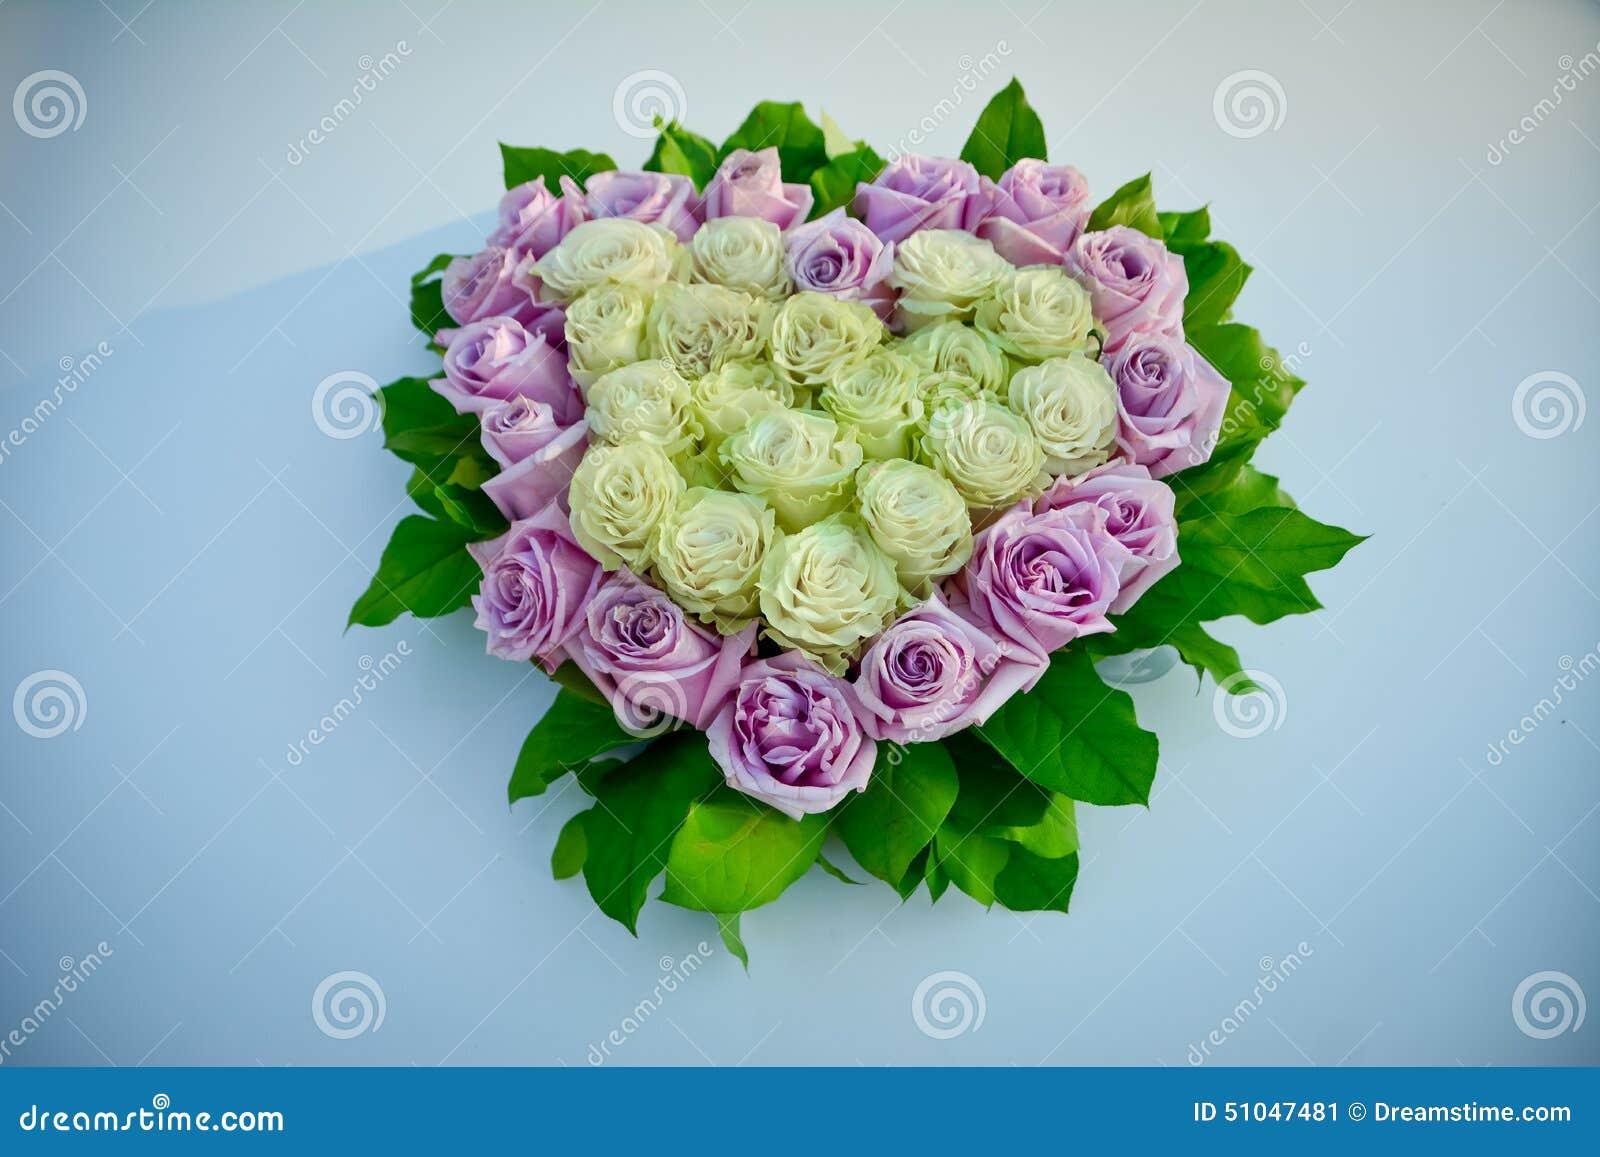 bouquet original de mariage photo stock image 51047481. Black Bedroom Furniture Sets. Home Design Ideas